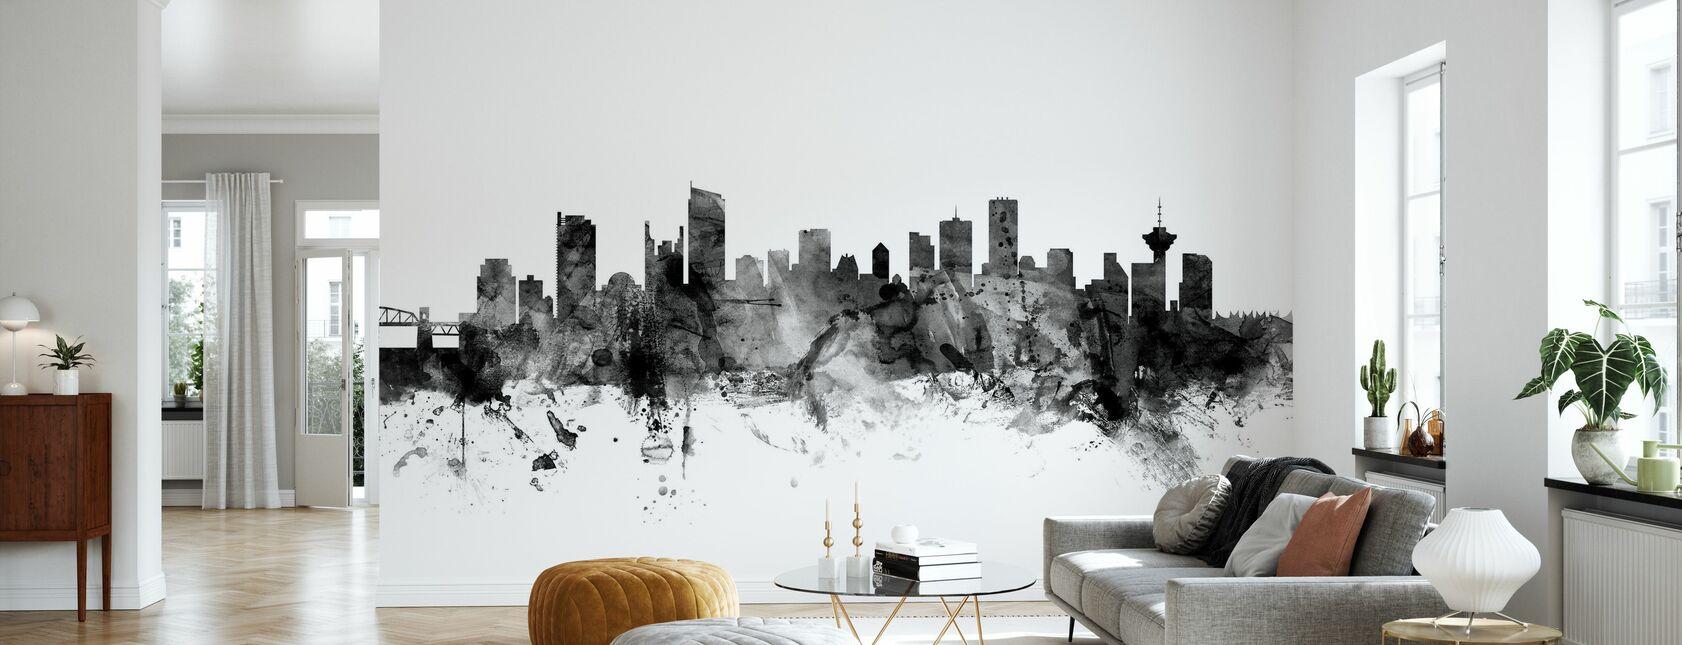 Vancouver Skyline Black - Wallpaper - Living Room